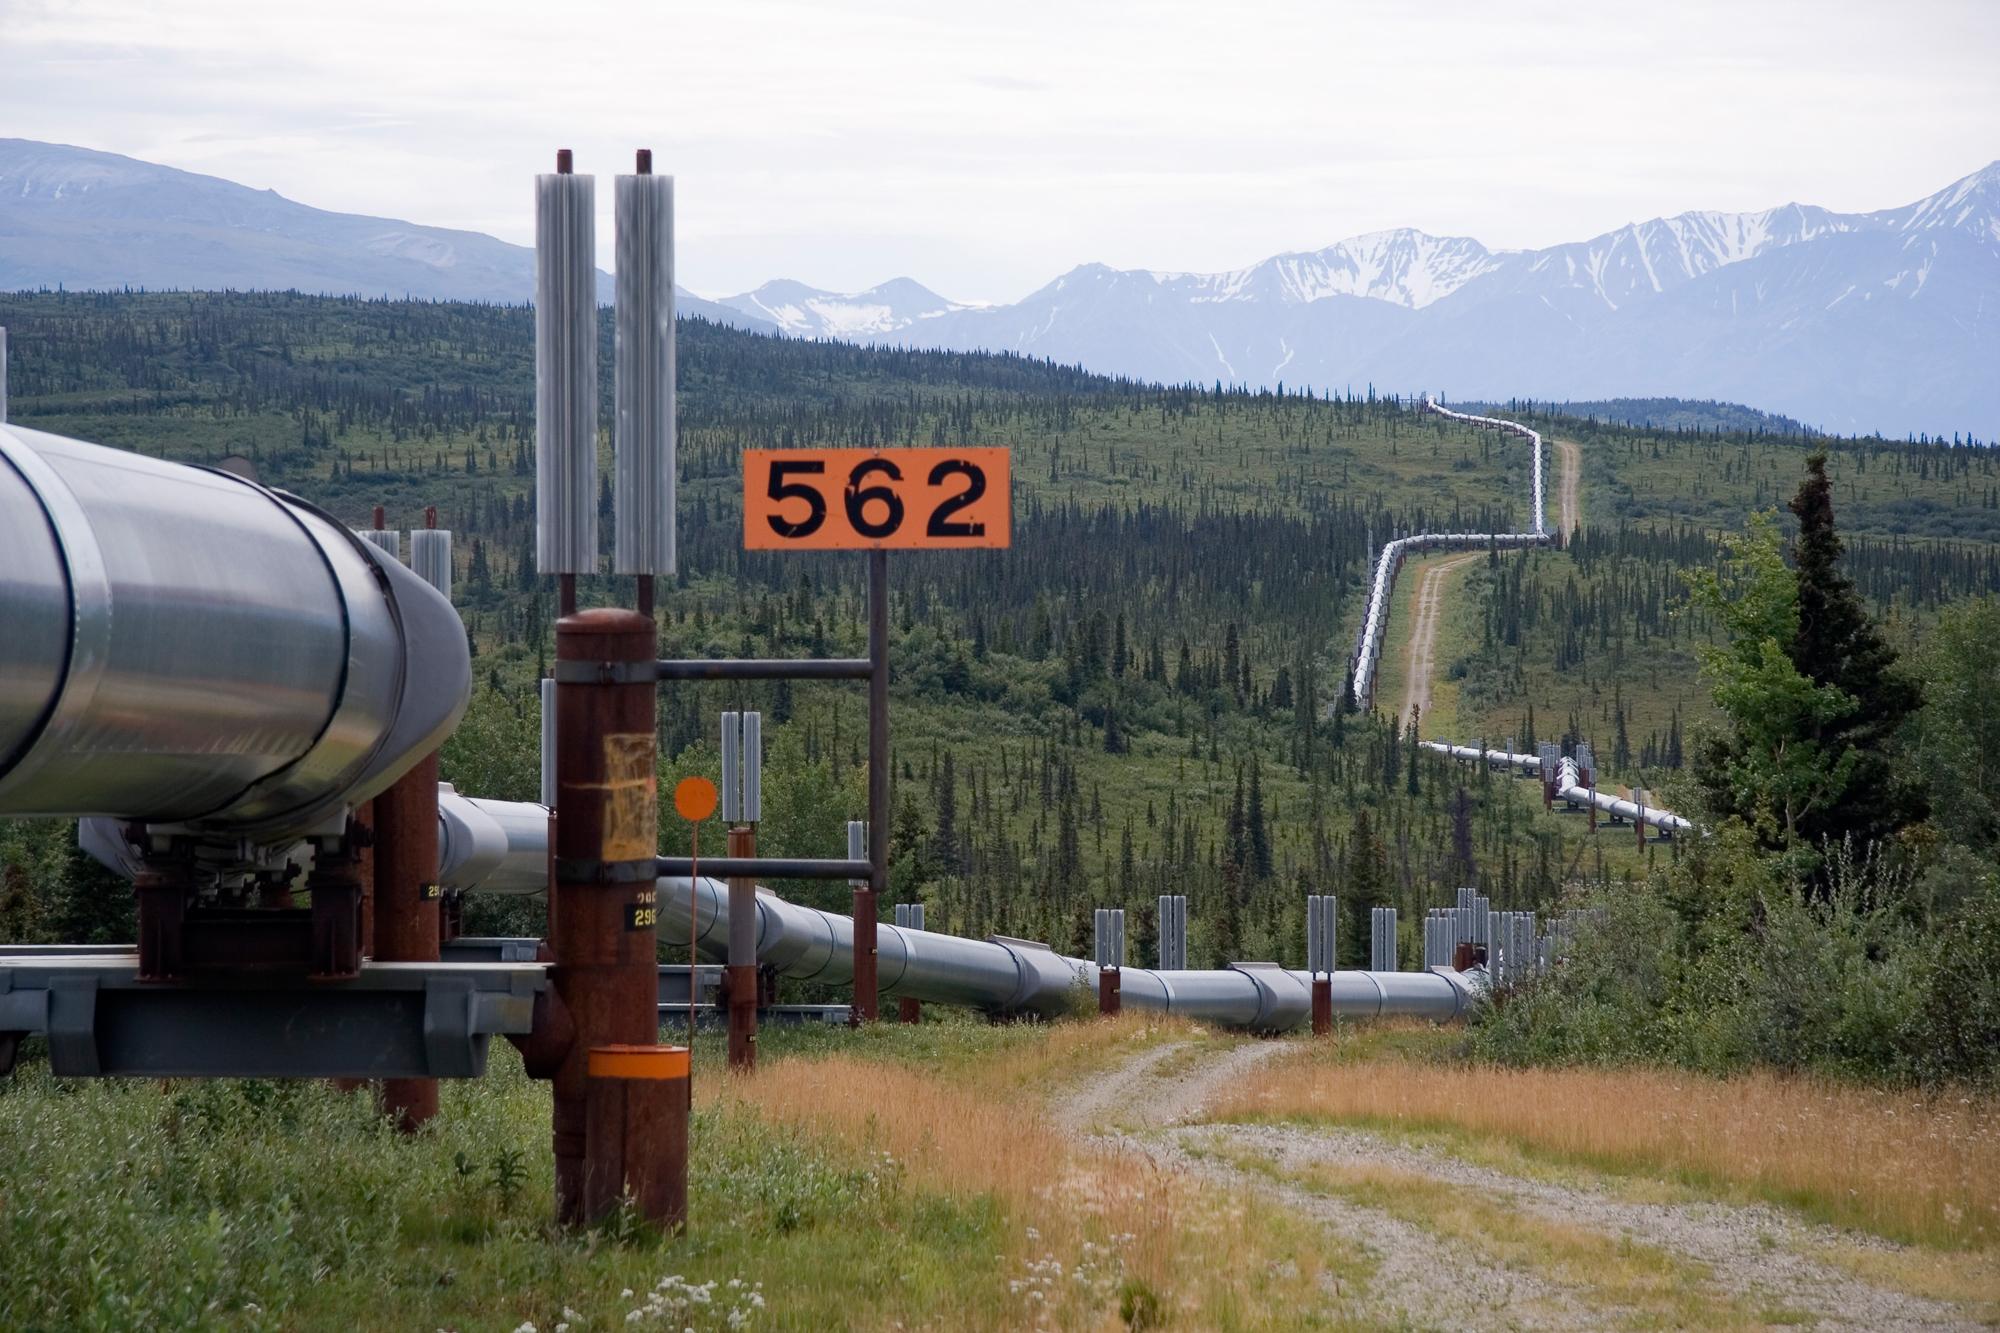 http://upload.wikimedia.org/wikipedia/commons/8/8f/Trans-Alaska_Pipeline_System_Luca_Galuzzi_2005.jpg